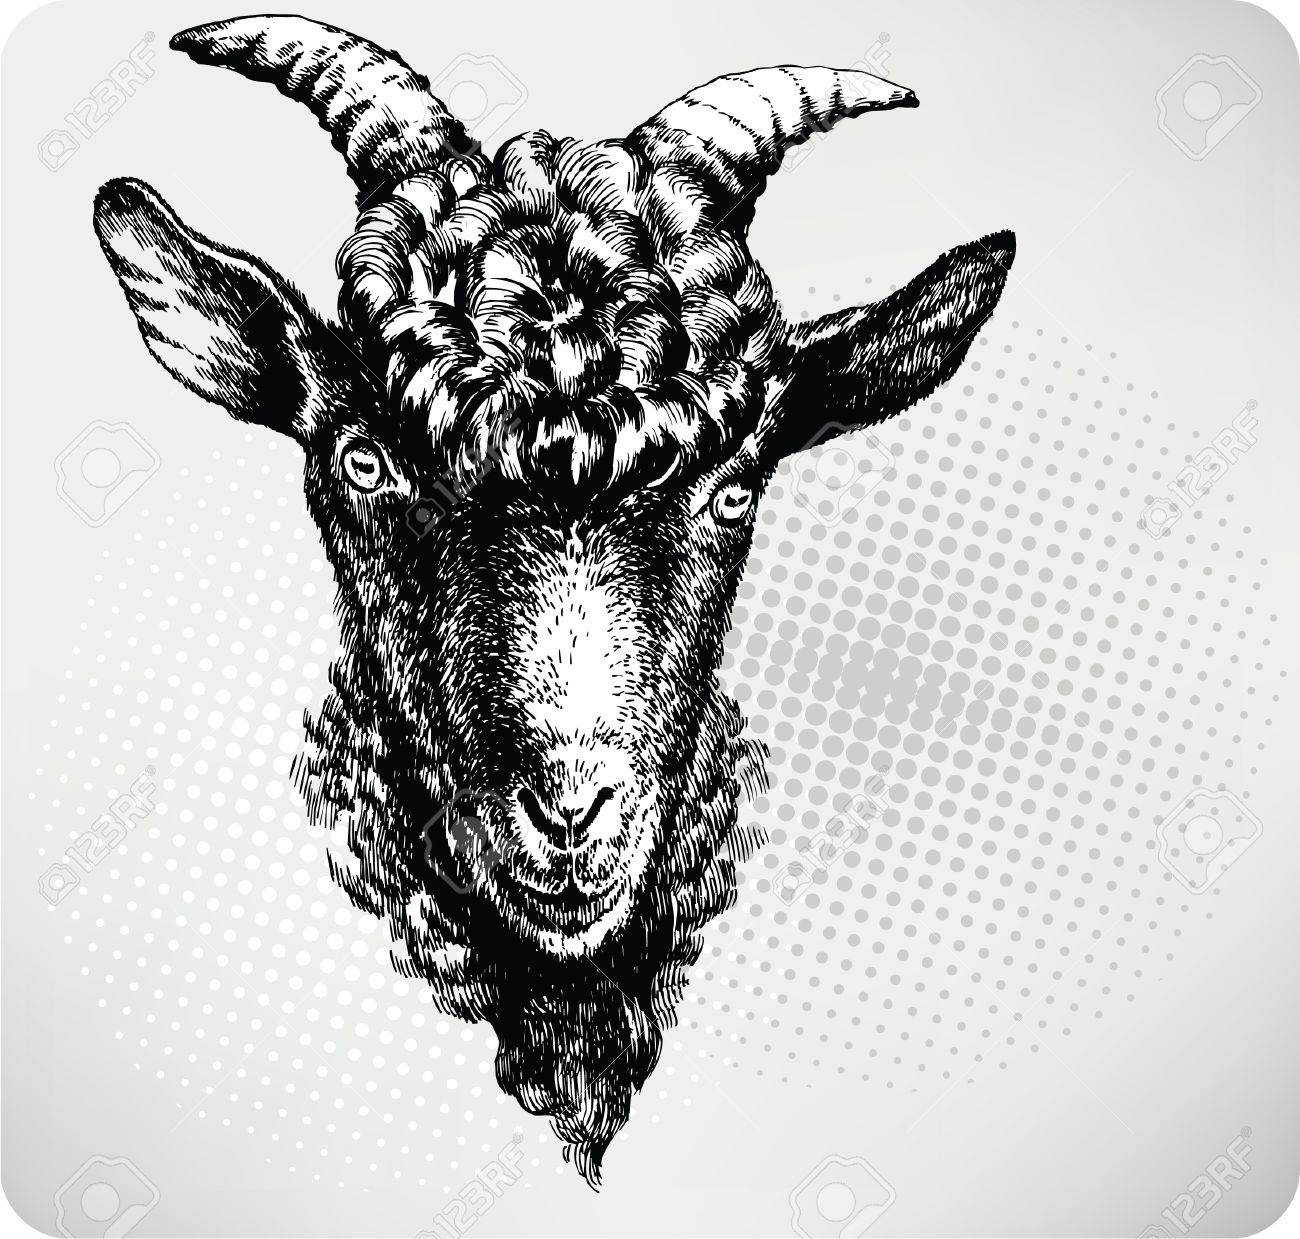 Black goat hand drawn. Vector illustration. Stock Vector - 11651233